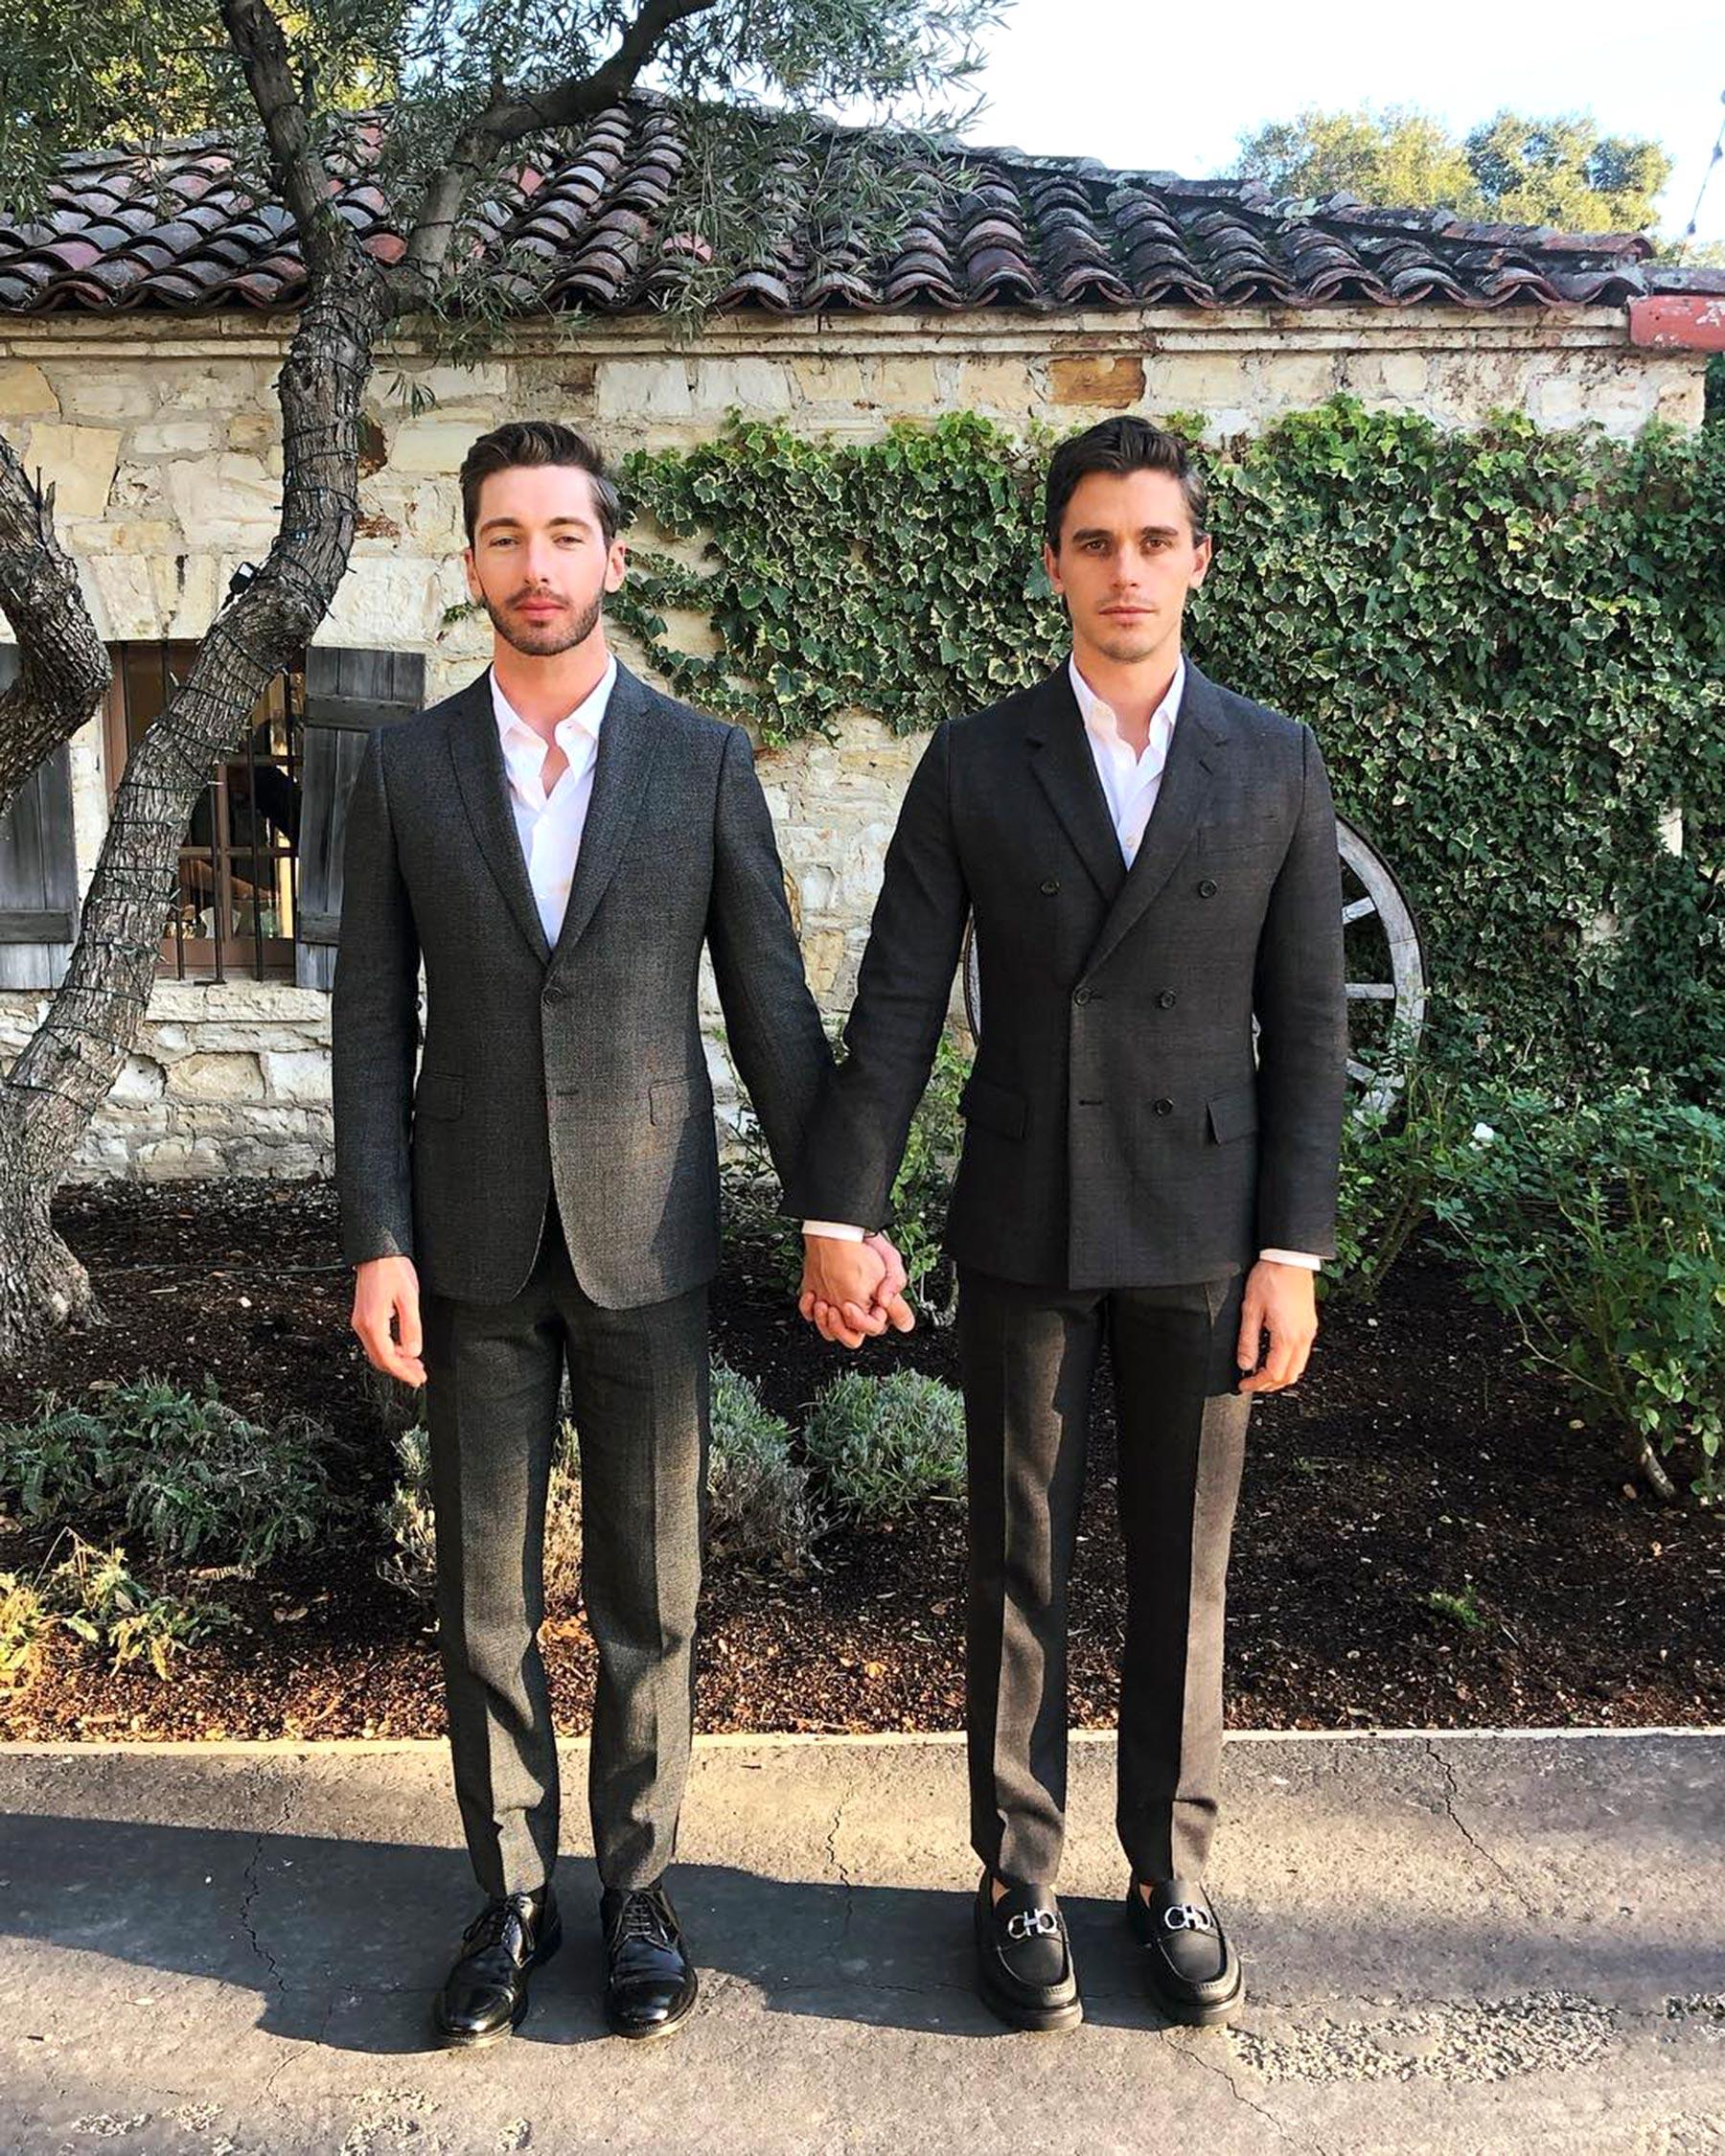 Queer Eye's Antoni Porowski & Flipping Out'sTrace Lehnhoff Make Their Instagram Debut as a Couple